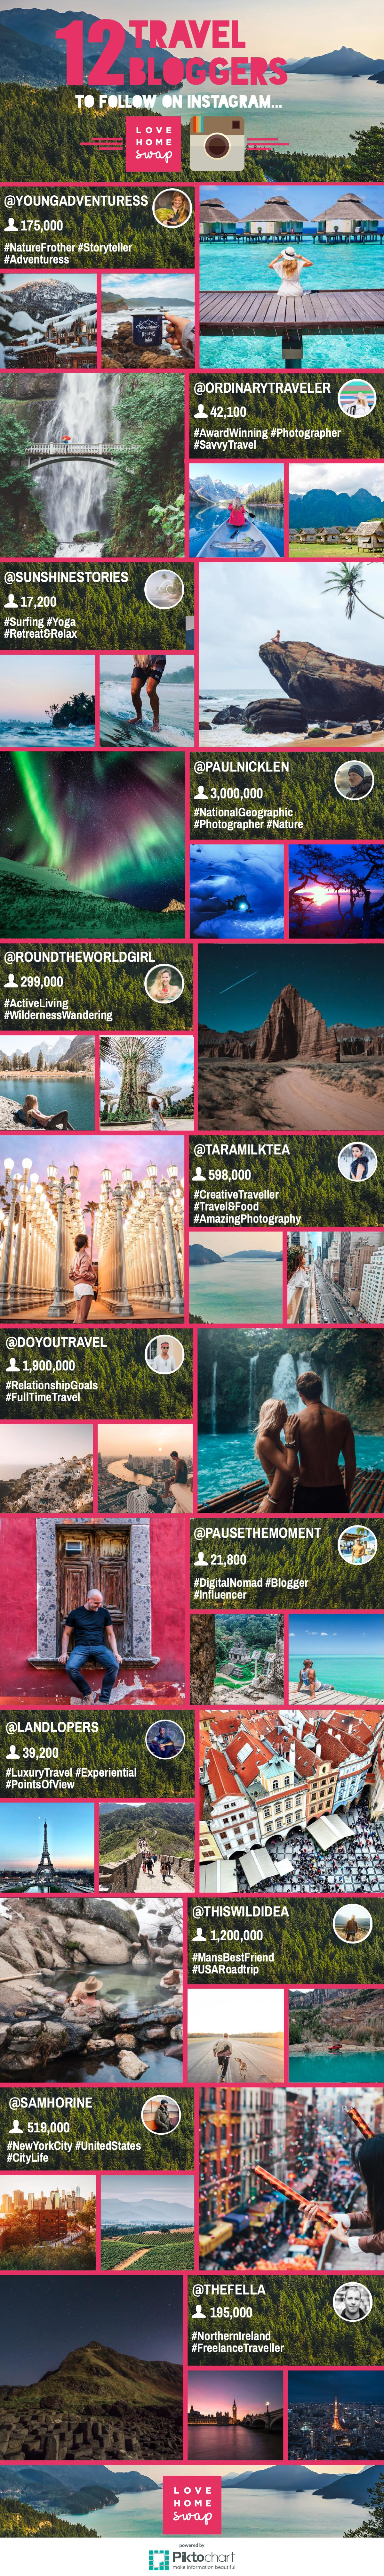 12 Travel Bloggers